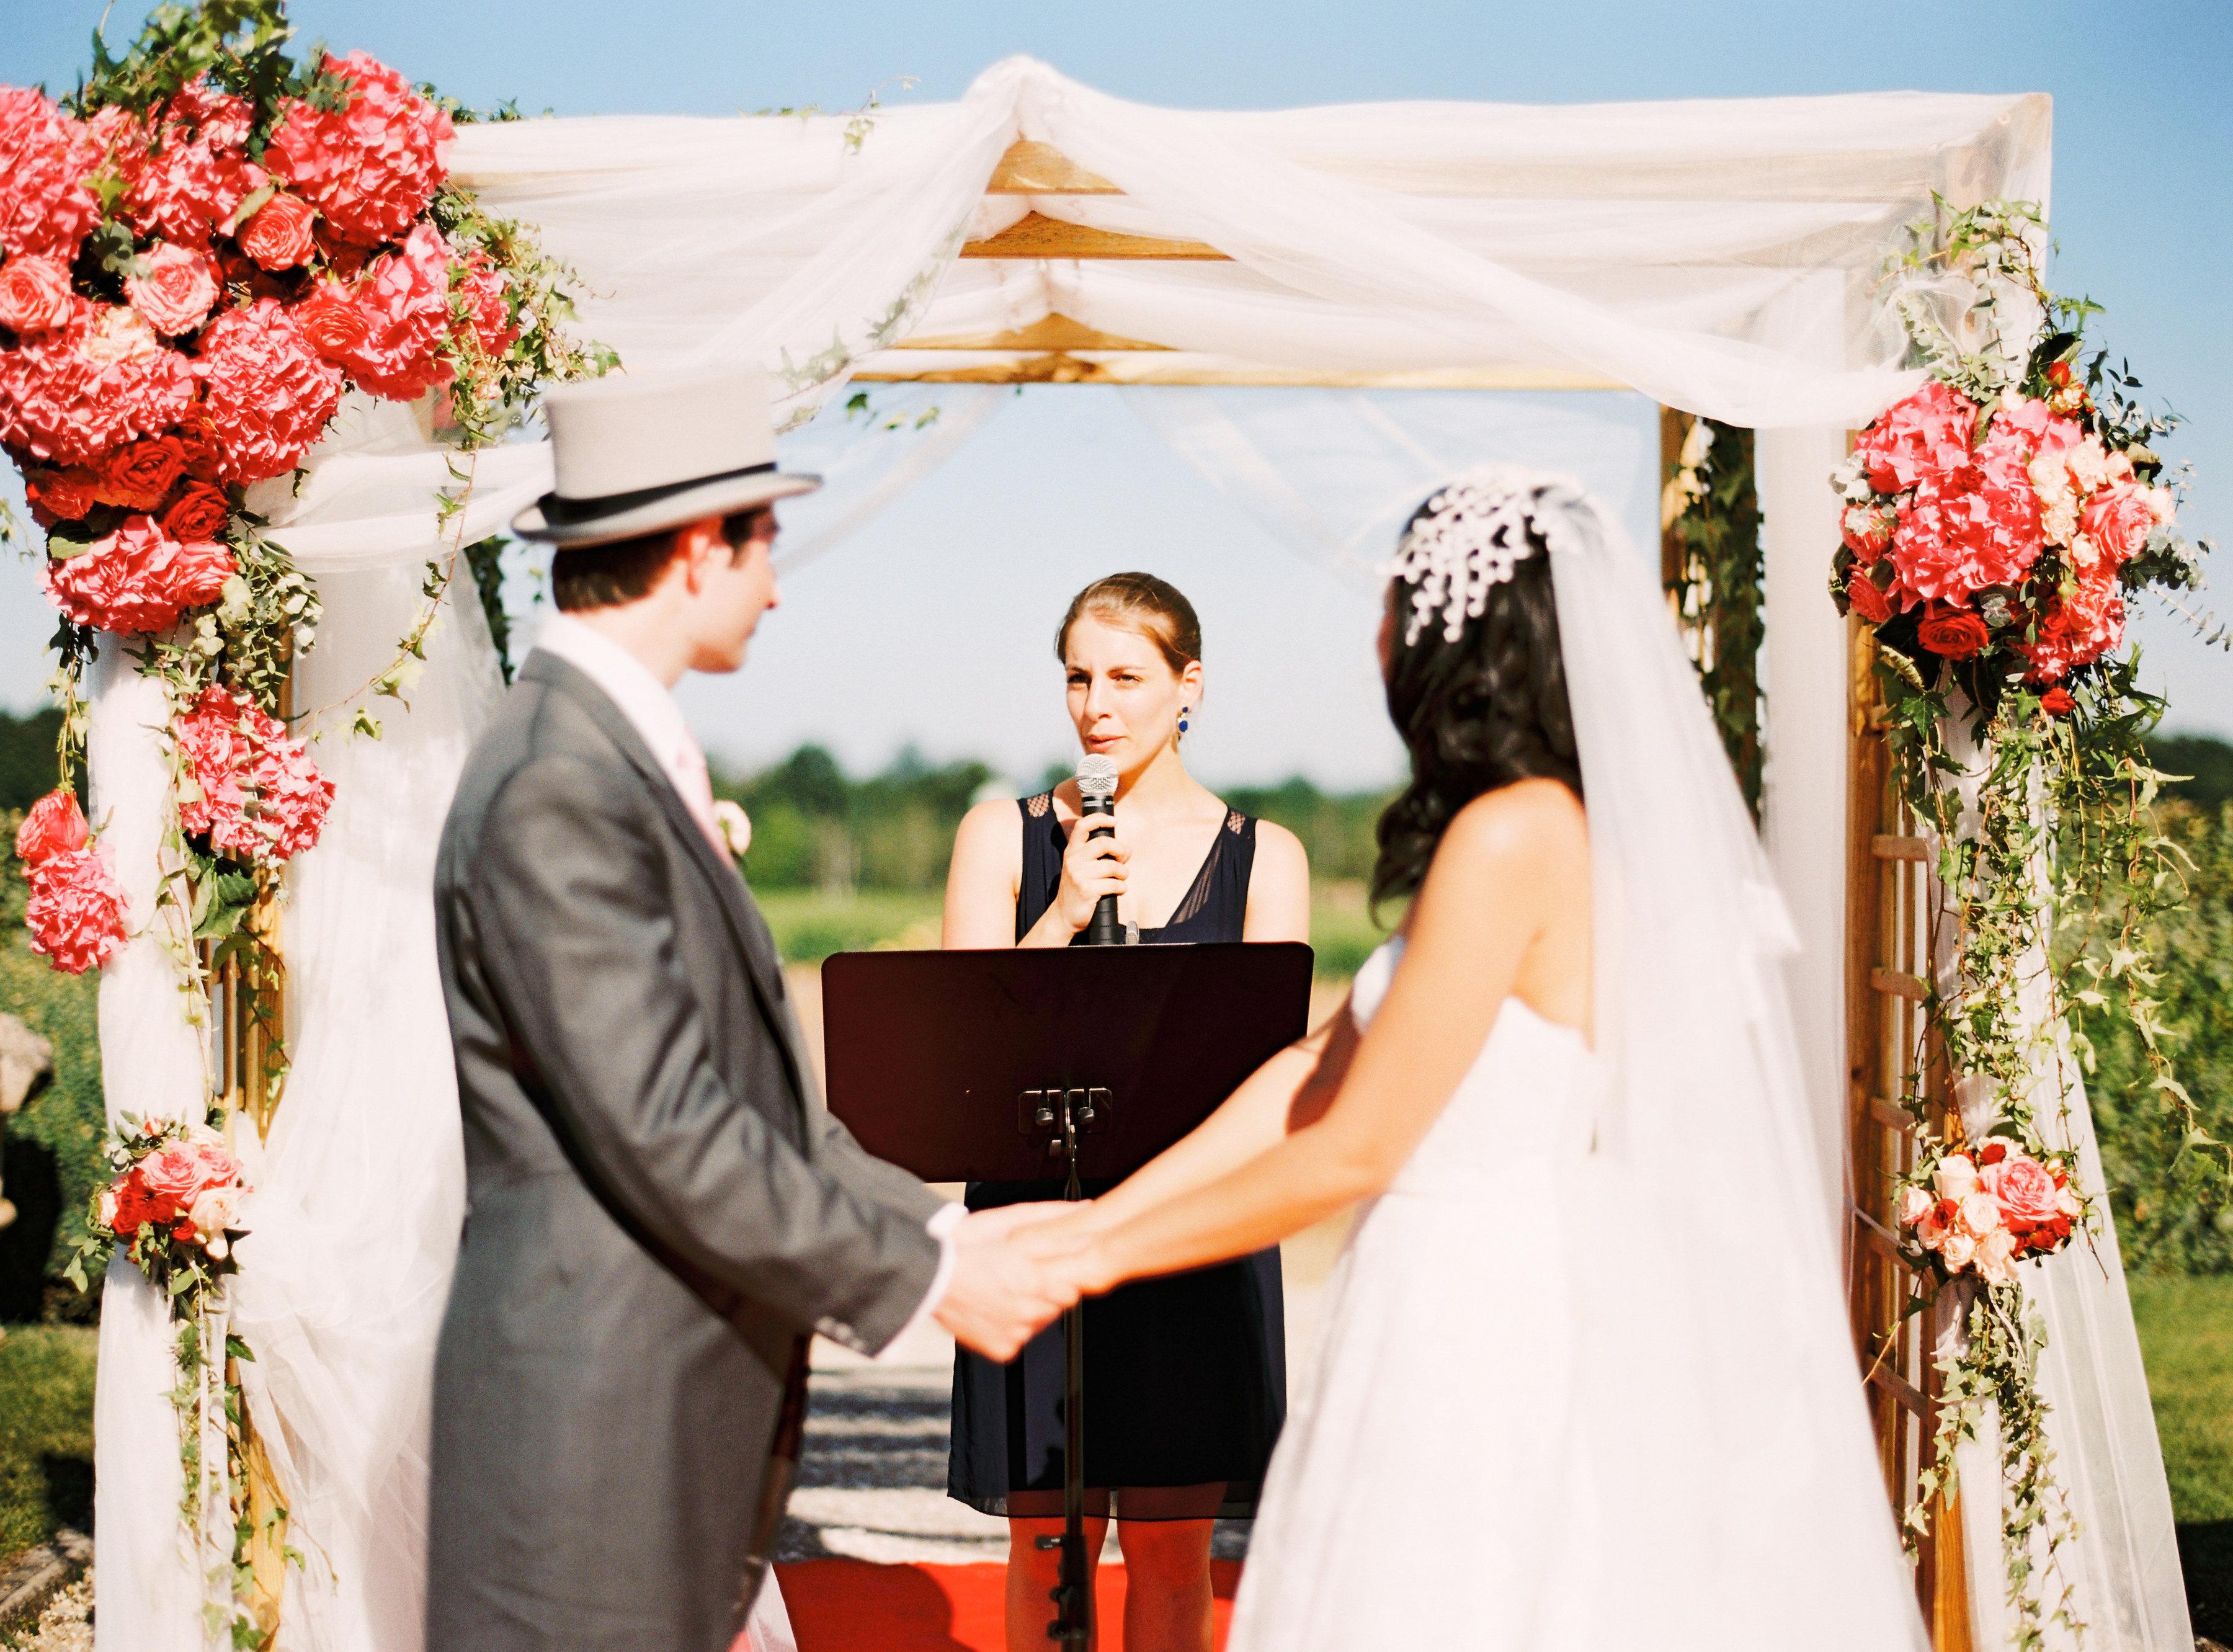 OssaPhoto-cérémonie-bilingue-bilingual-ceremony-officiante